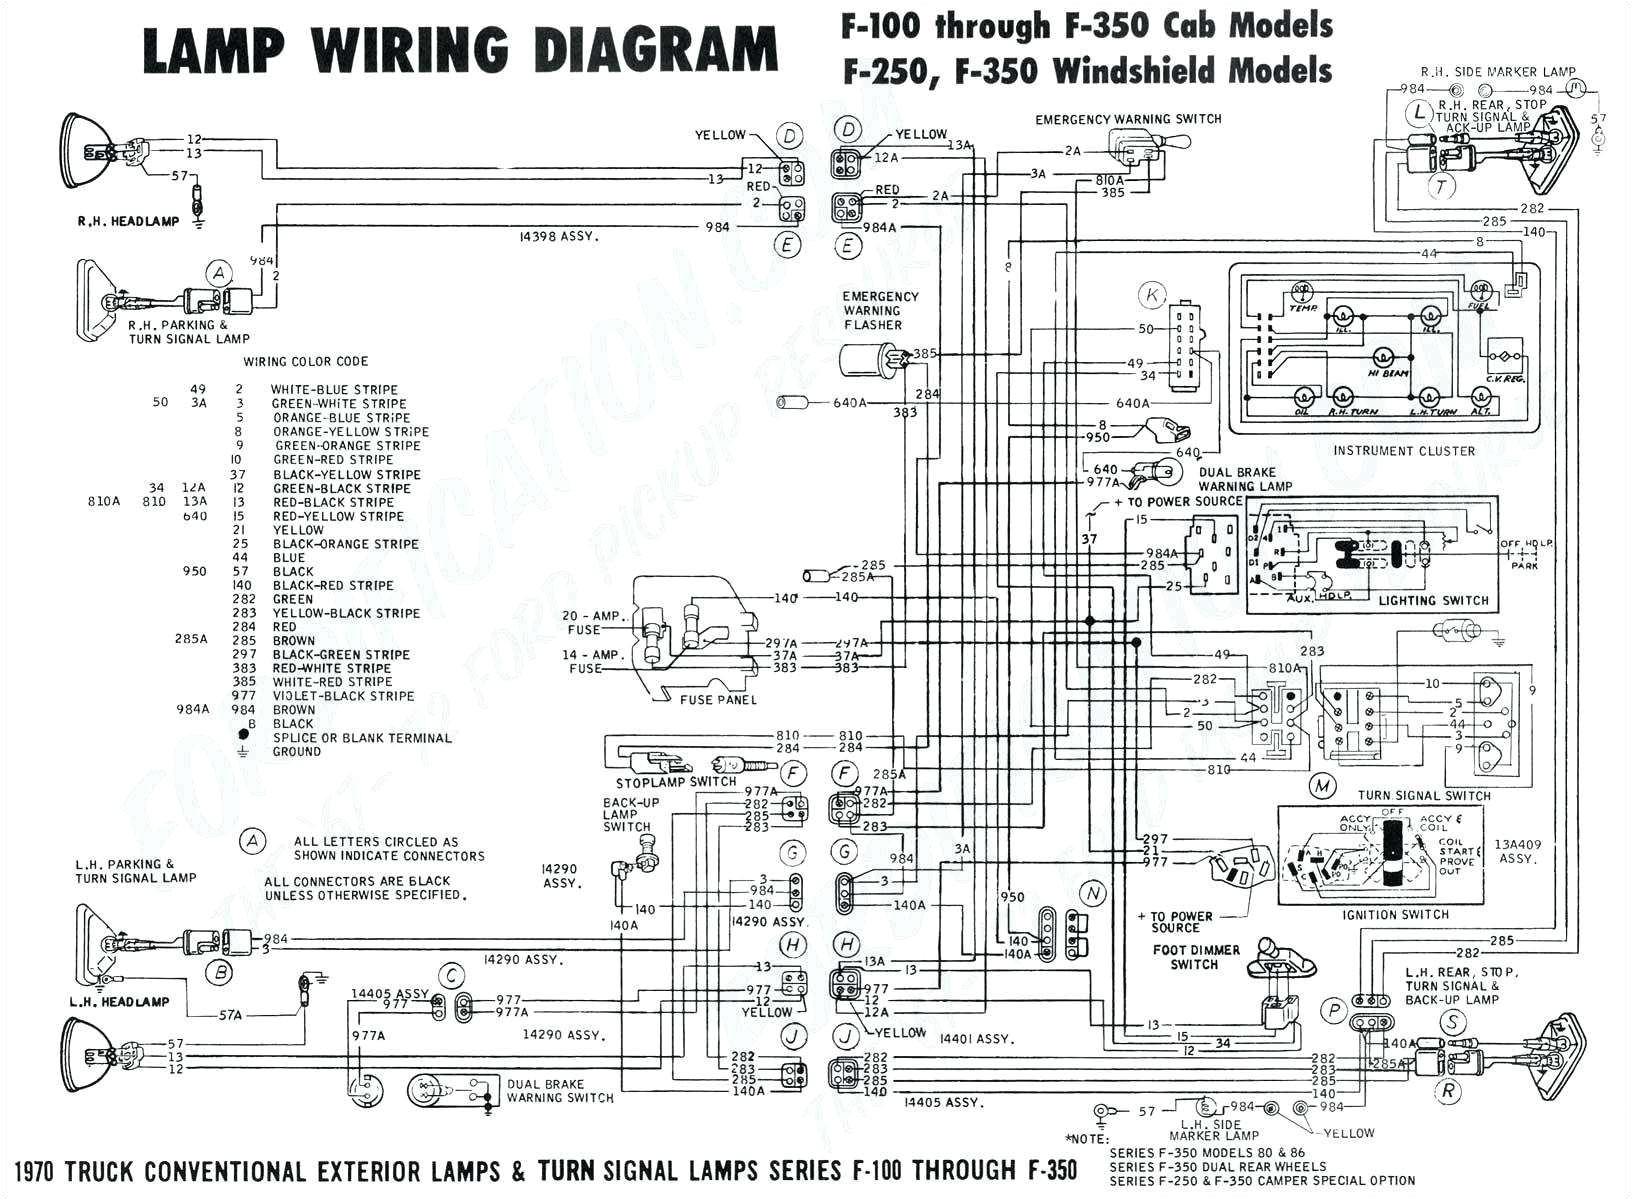 1996 Dodge Ram 1500 Headlight Switch Wiring Diagram 2004 Dodge Ram Headlight Wiring Diagram Wiring Diagram Name